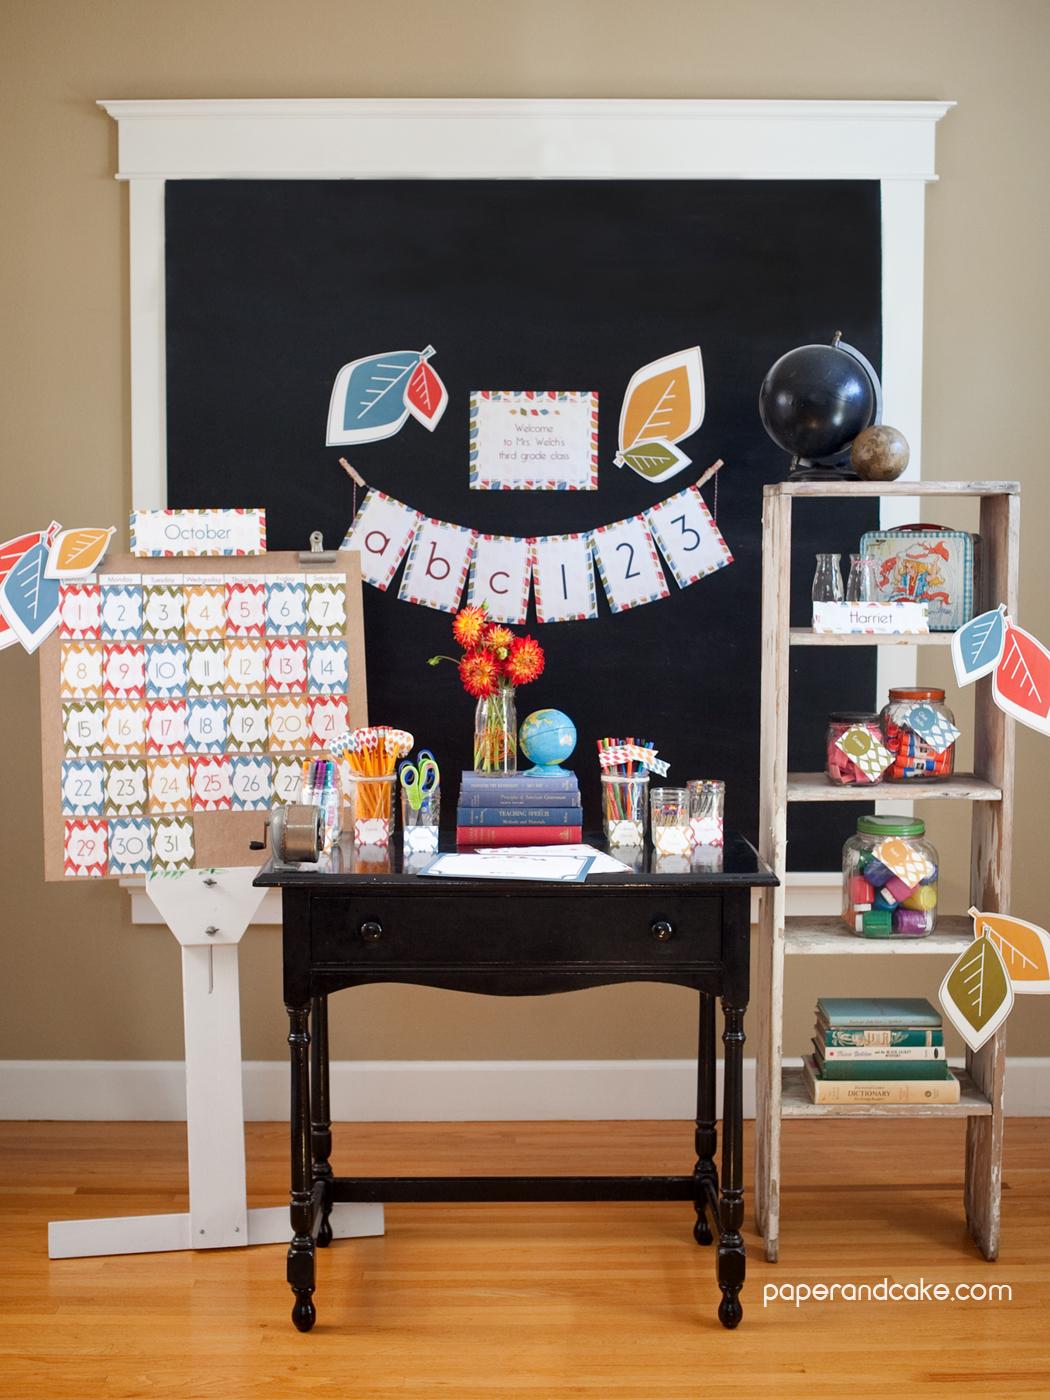 Classroom Decoration Ideas Printables : Mod fall printable classroom decorations paper and cake